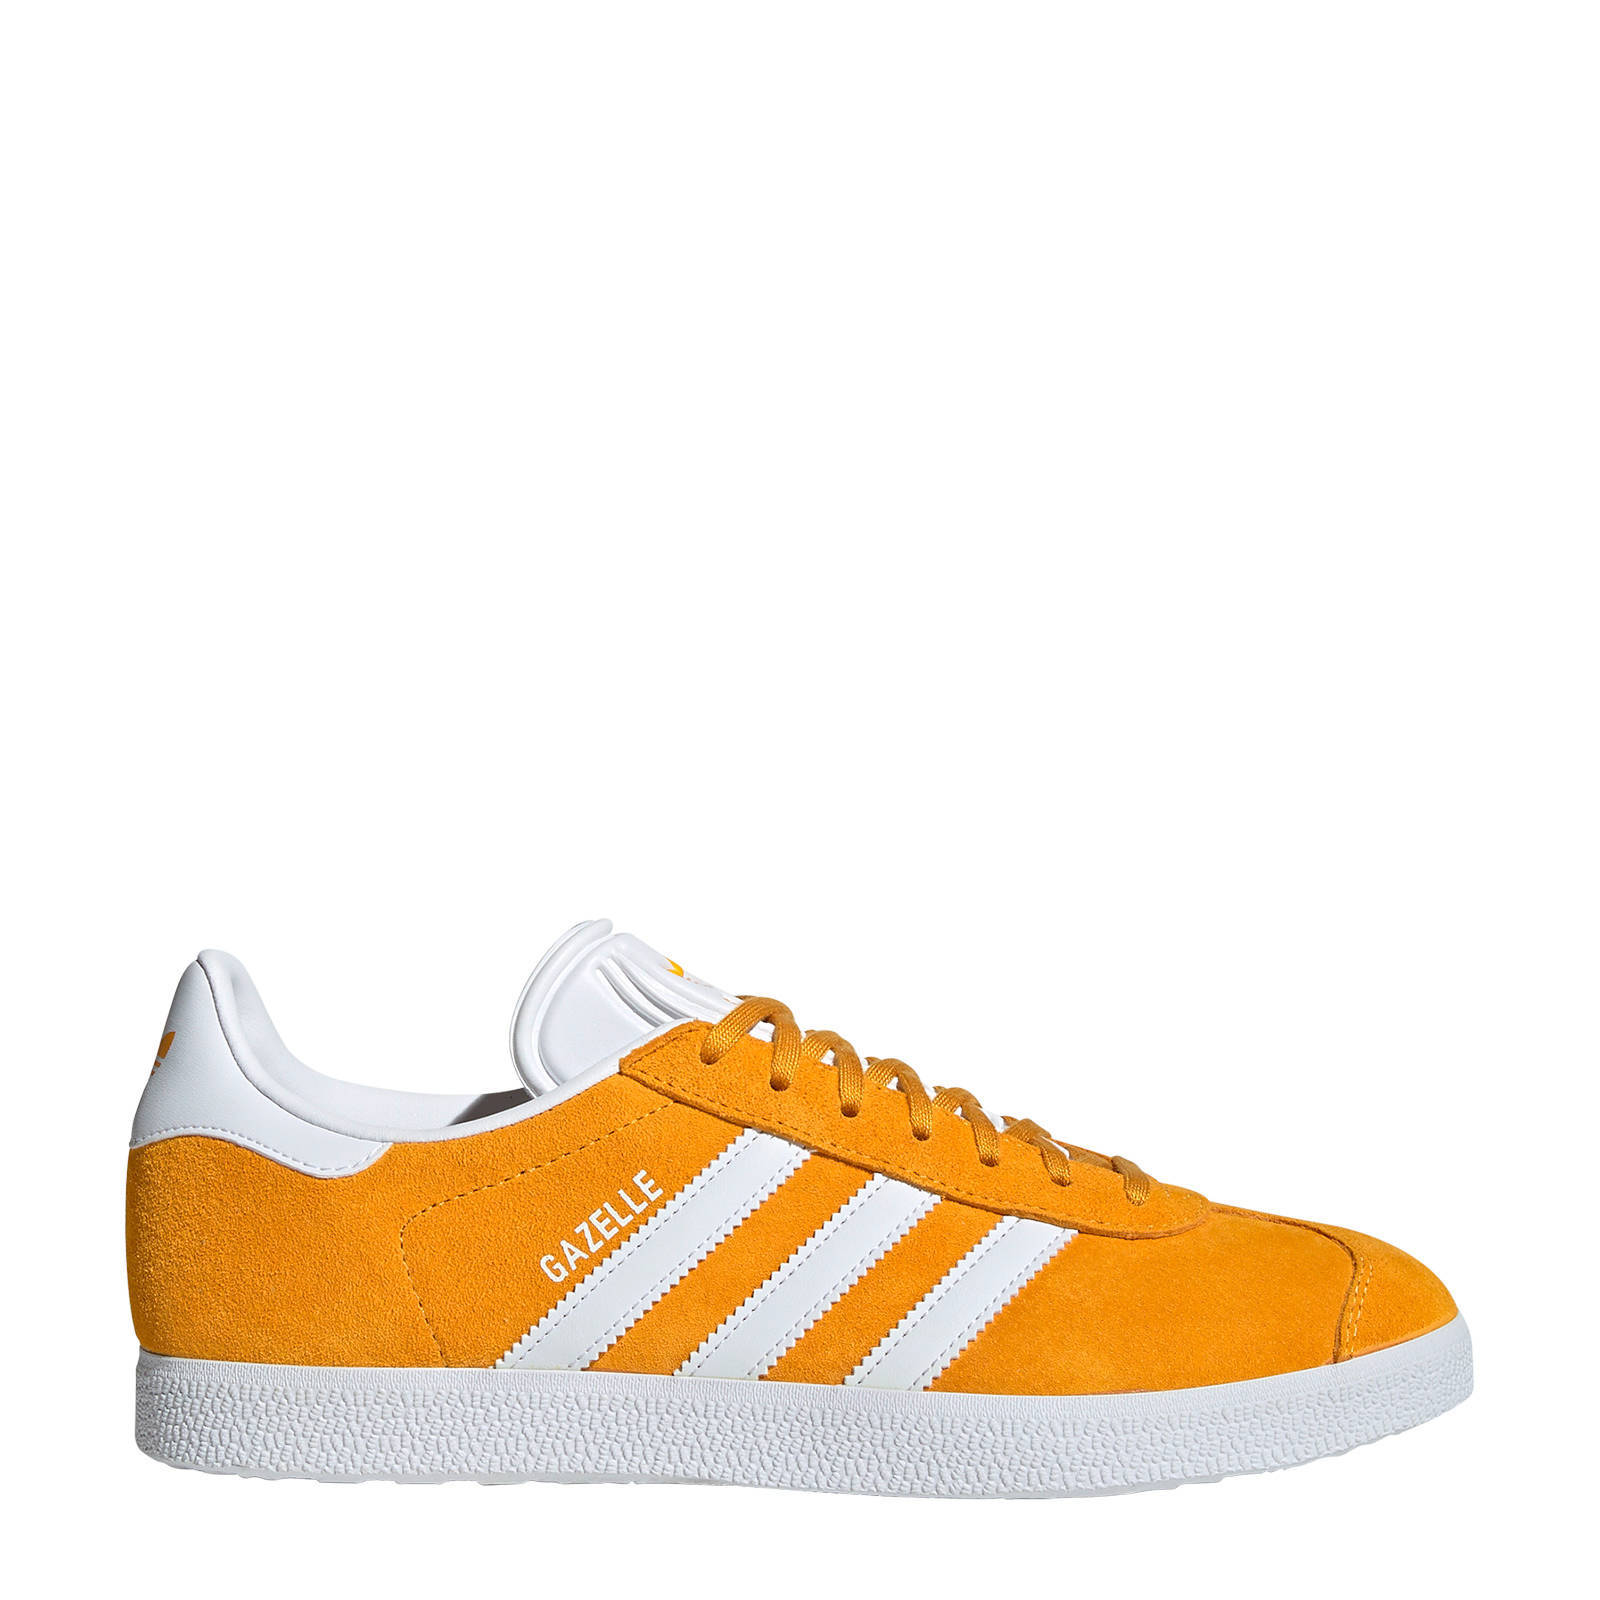 adidas Gazelle schoenen geel